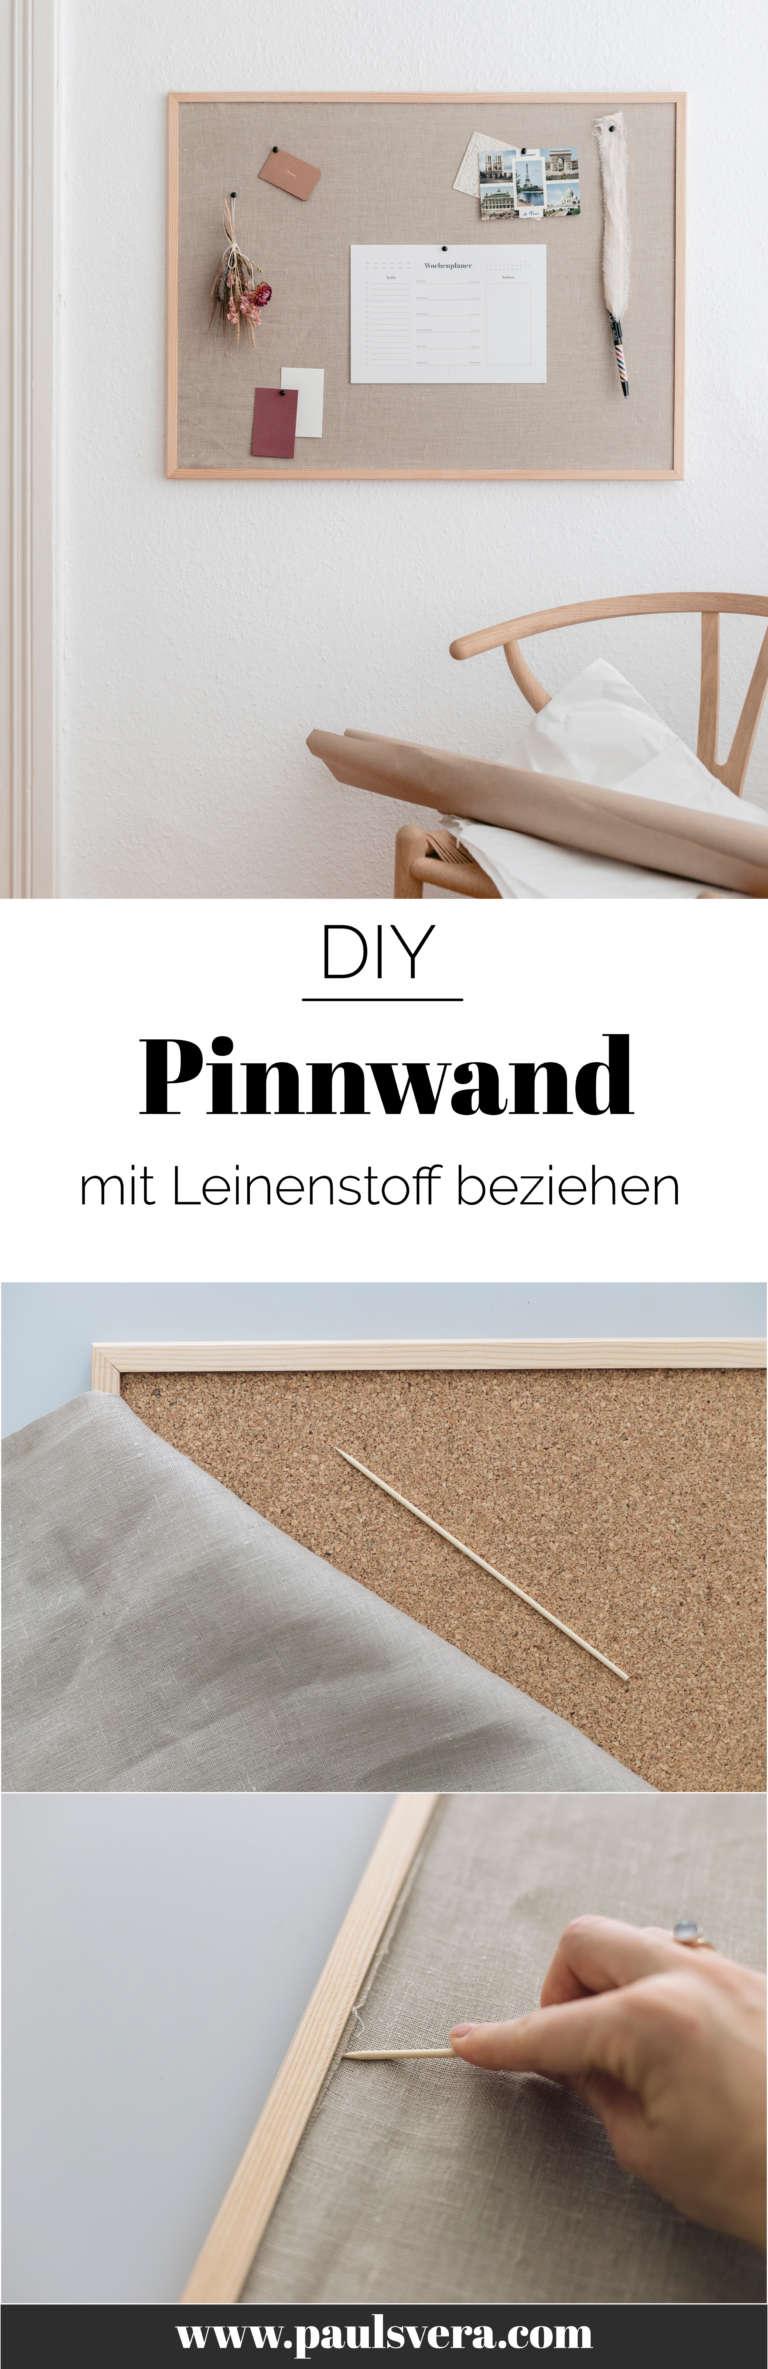 Diy Pinnwand